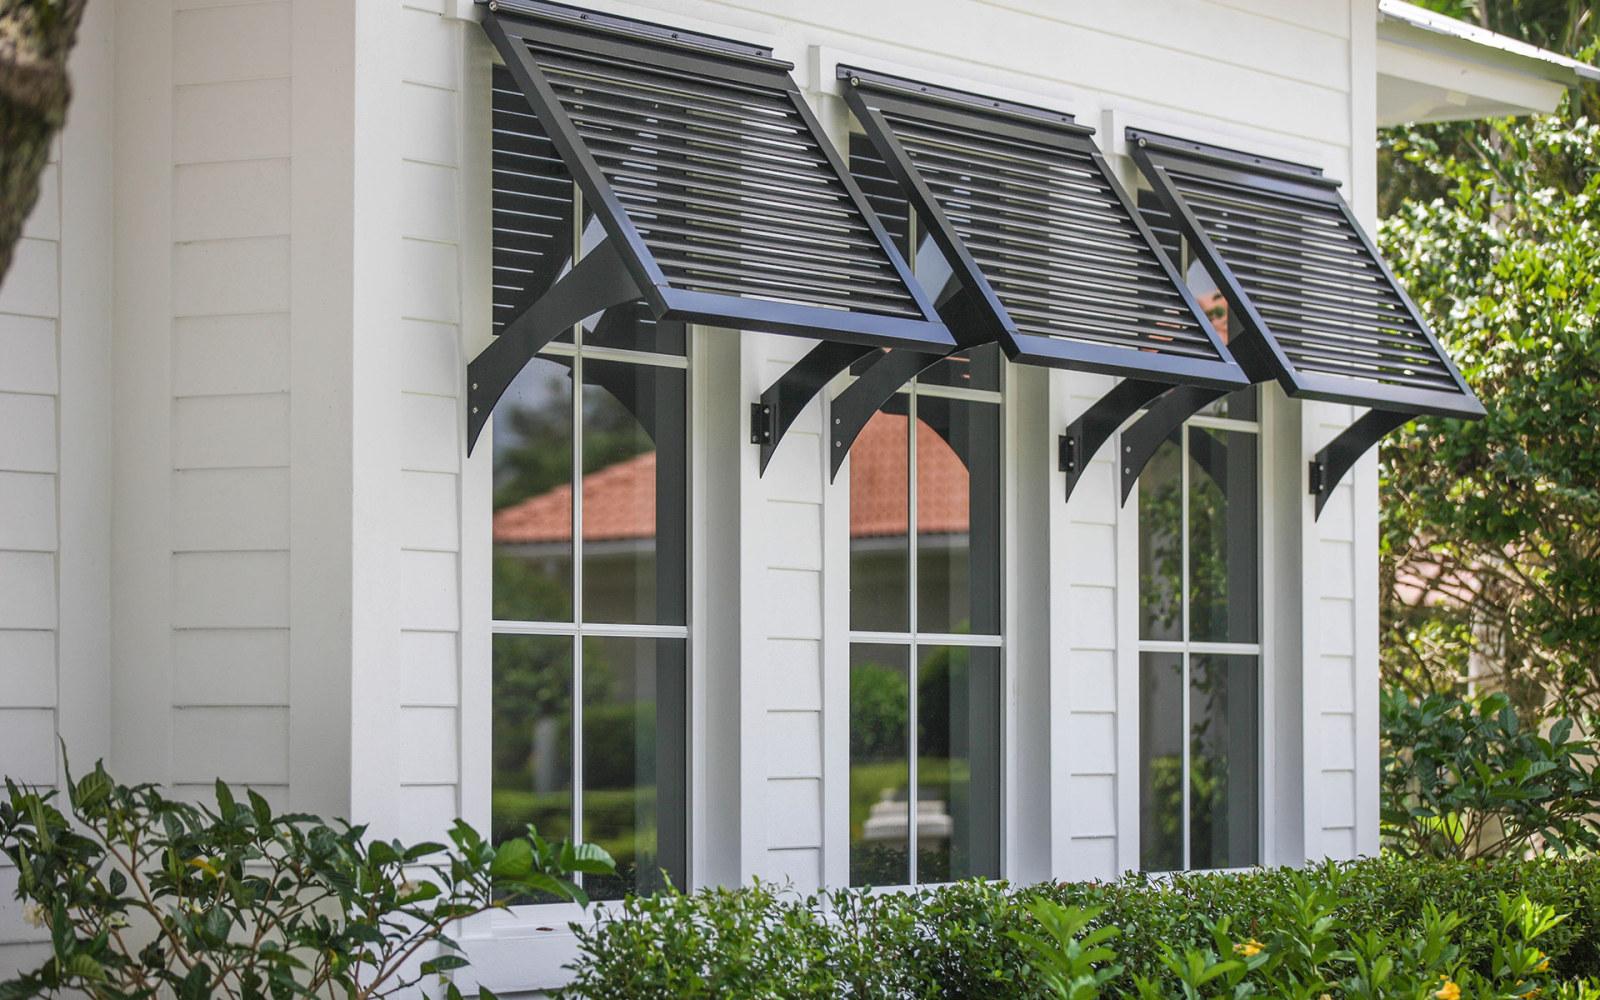 bahama shutters by marc julien homes FXTBTVU